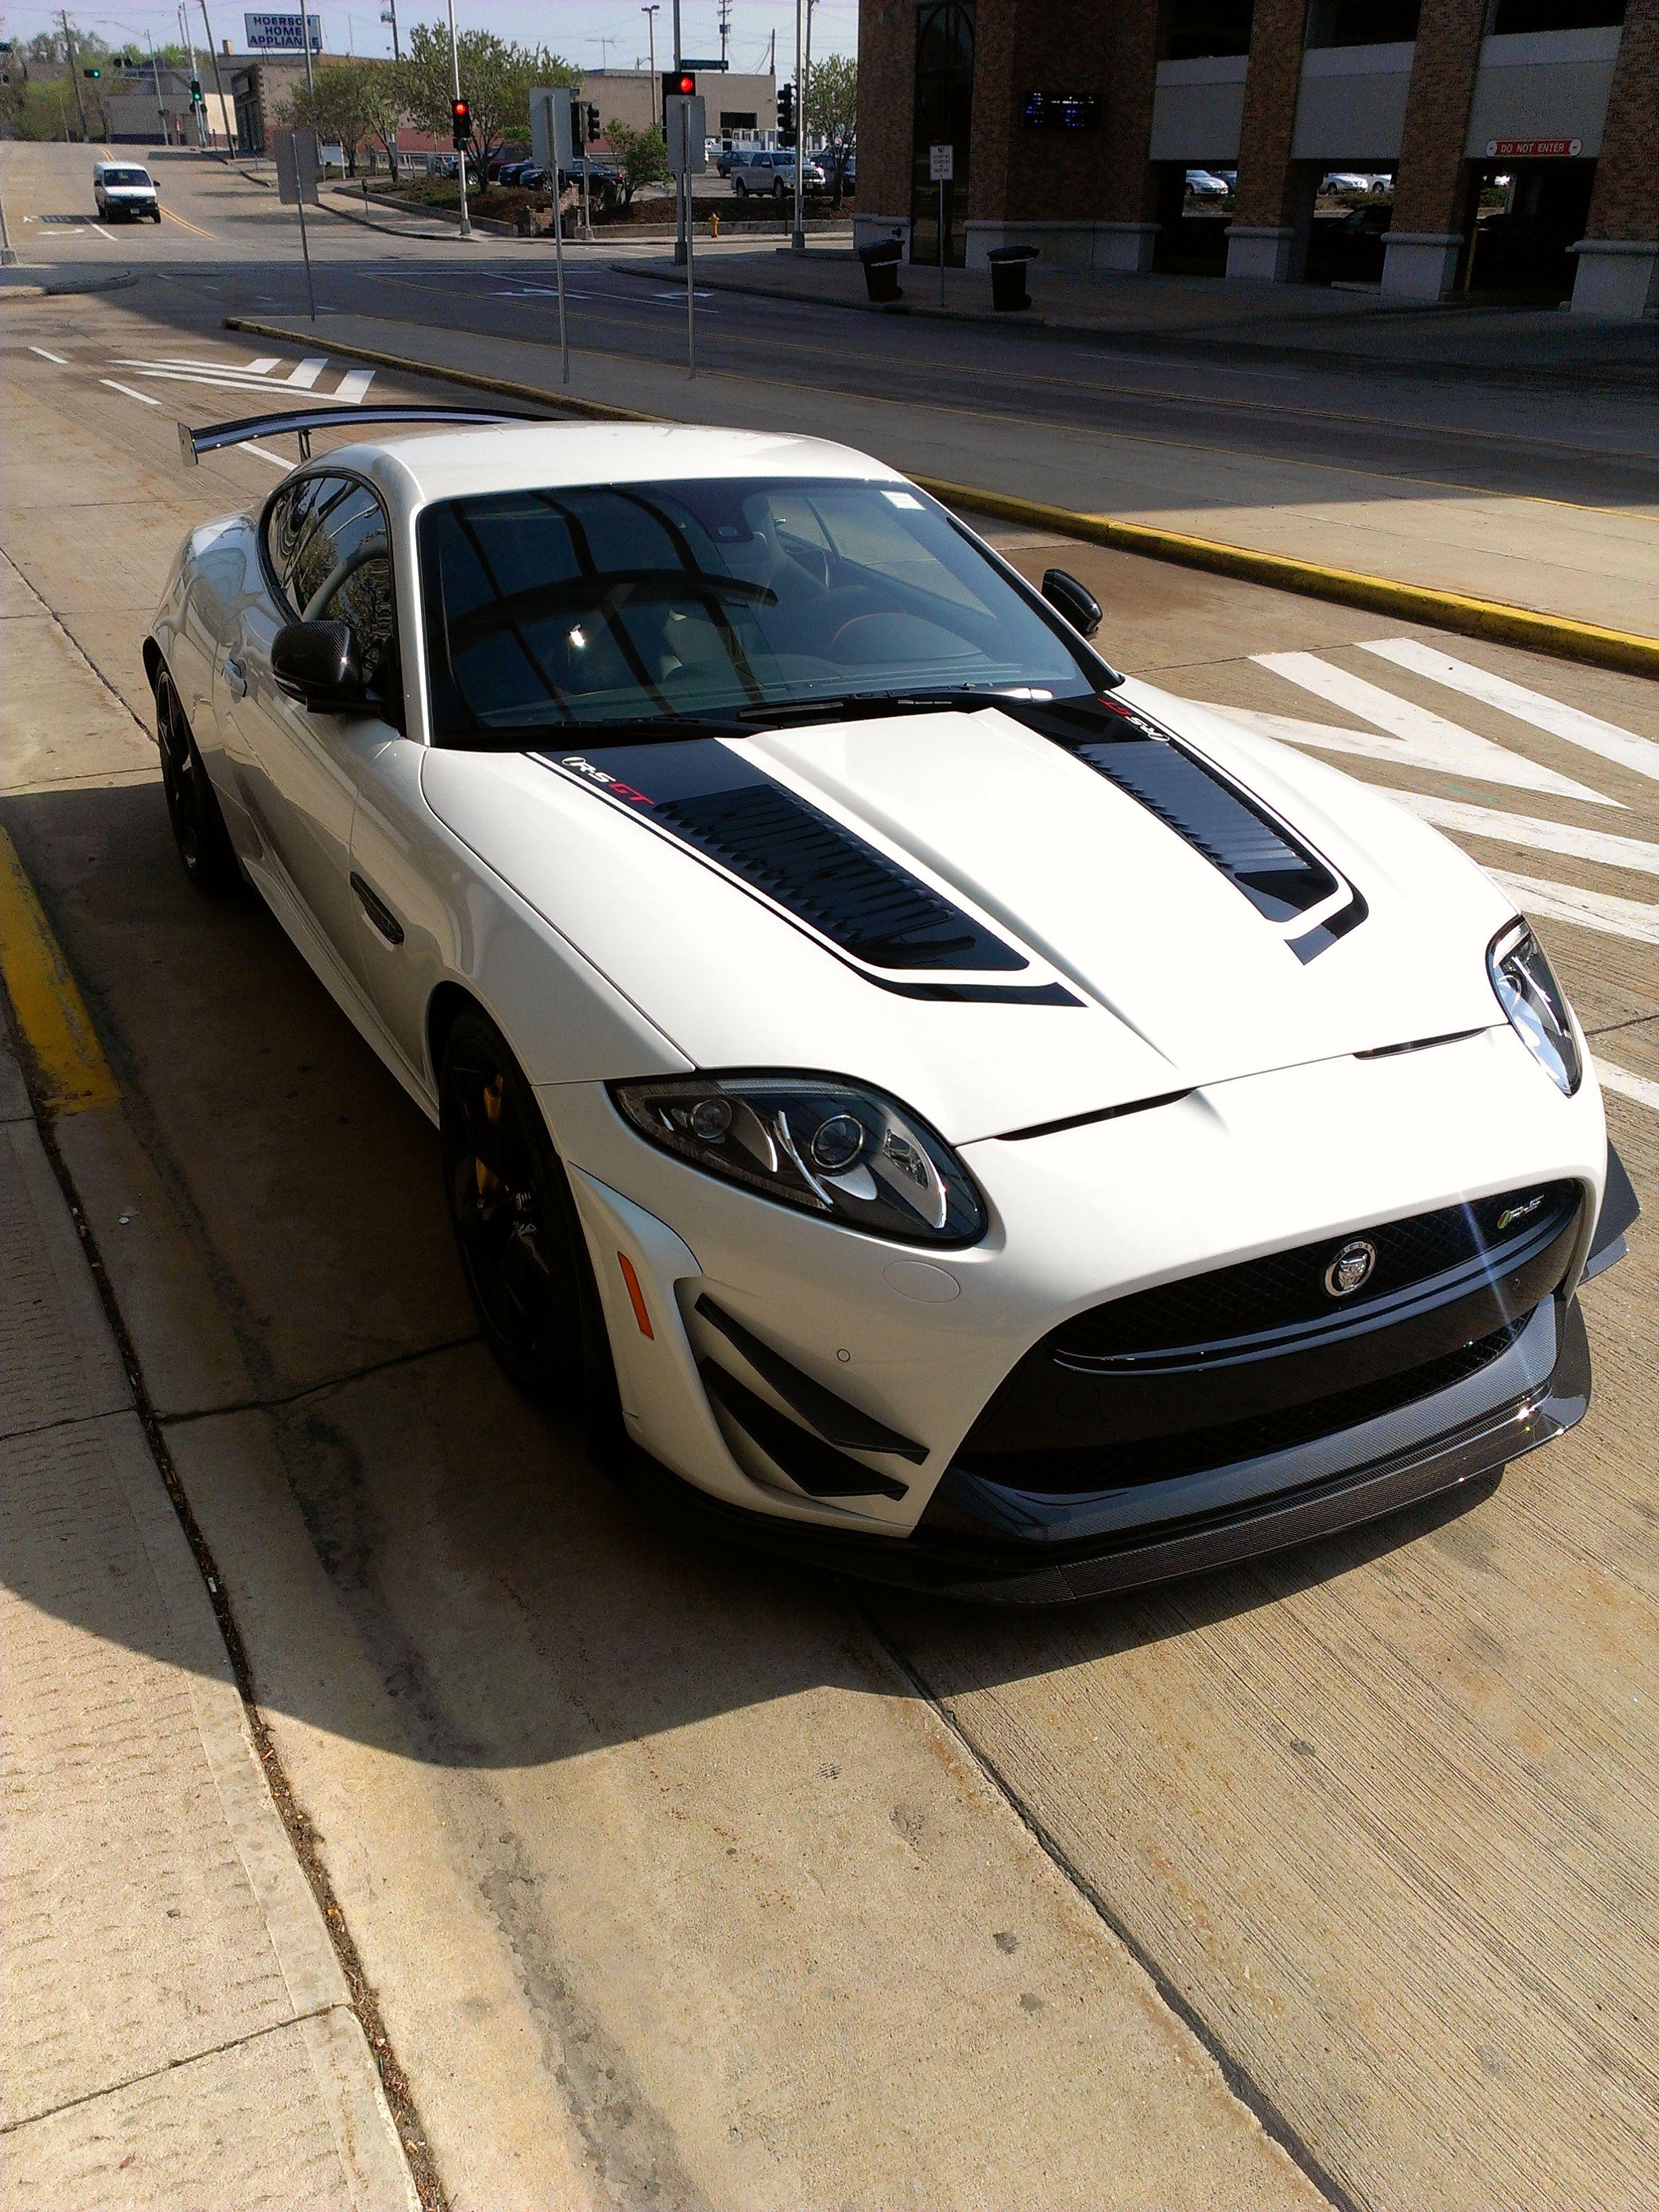 hd transportation car wallpaper full jaguar fullhdwpp f wallpapers coupe wide cars type